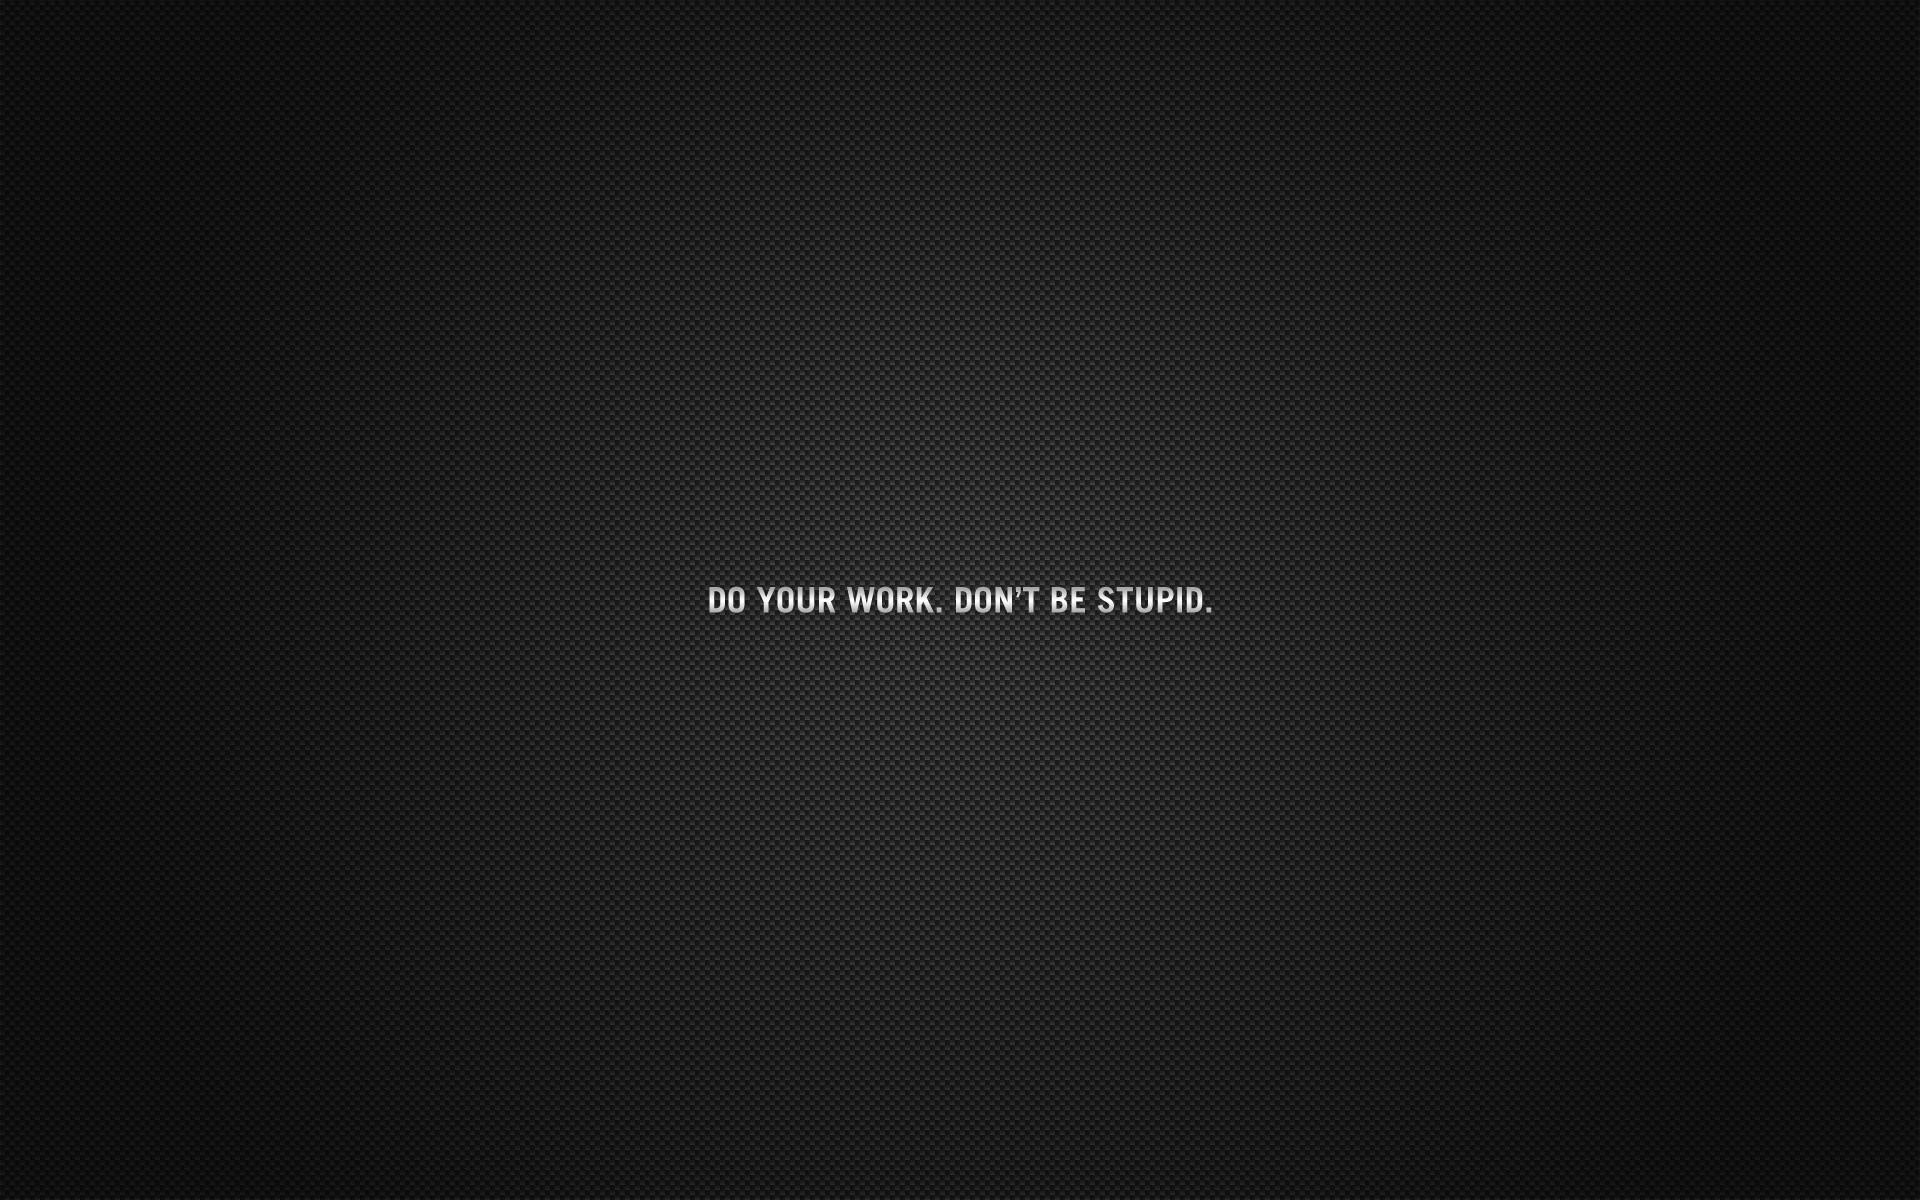 Wallpaper Black Quote Minimalism Typography Text